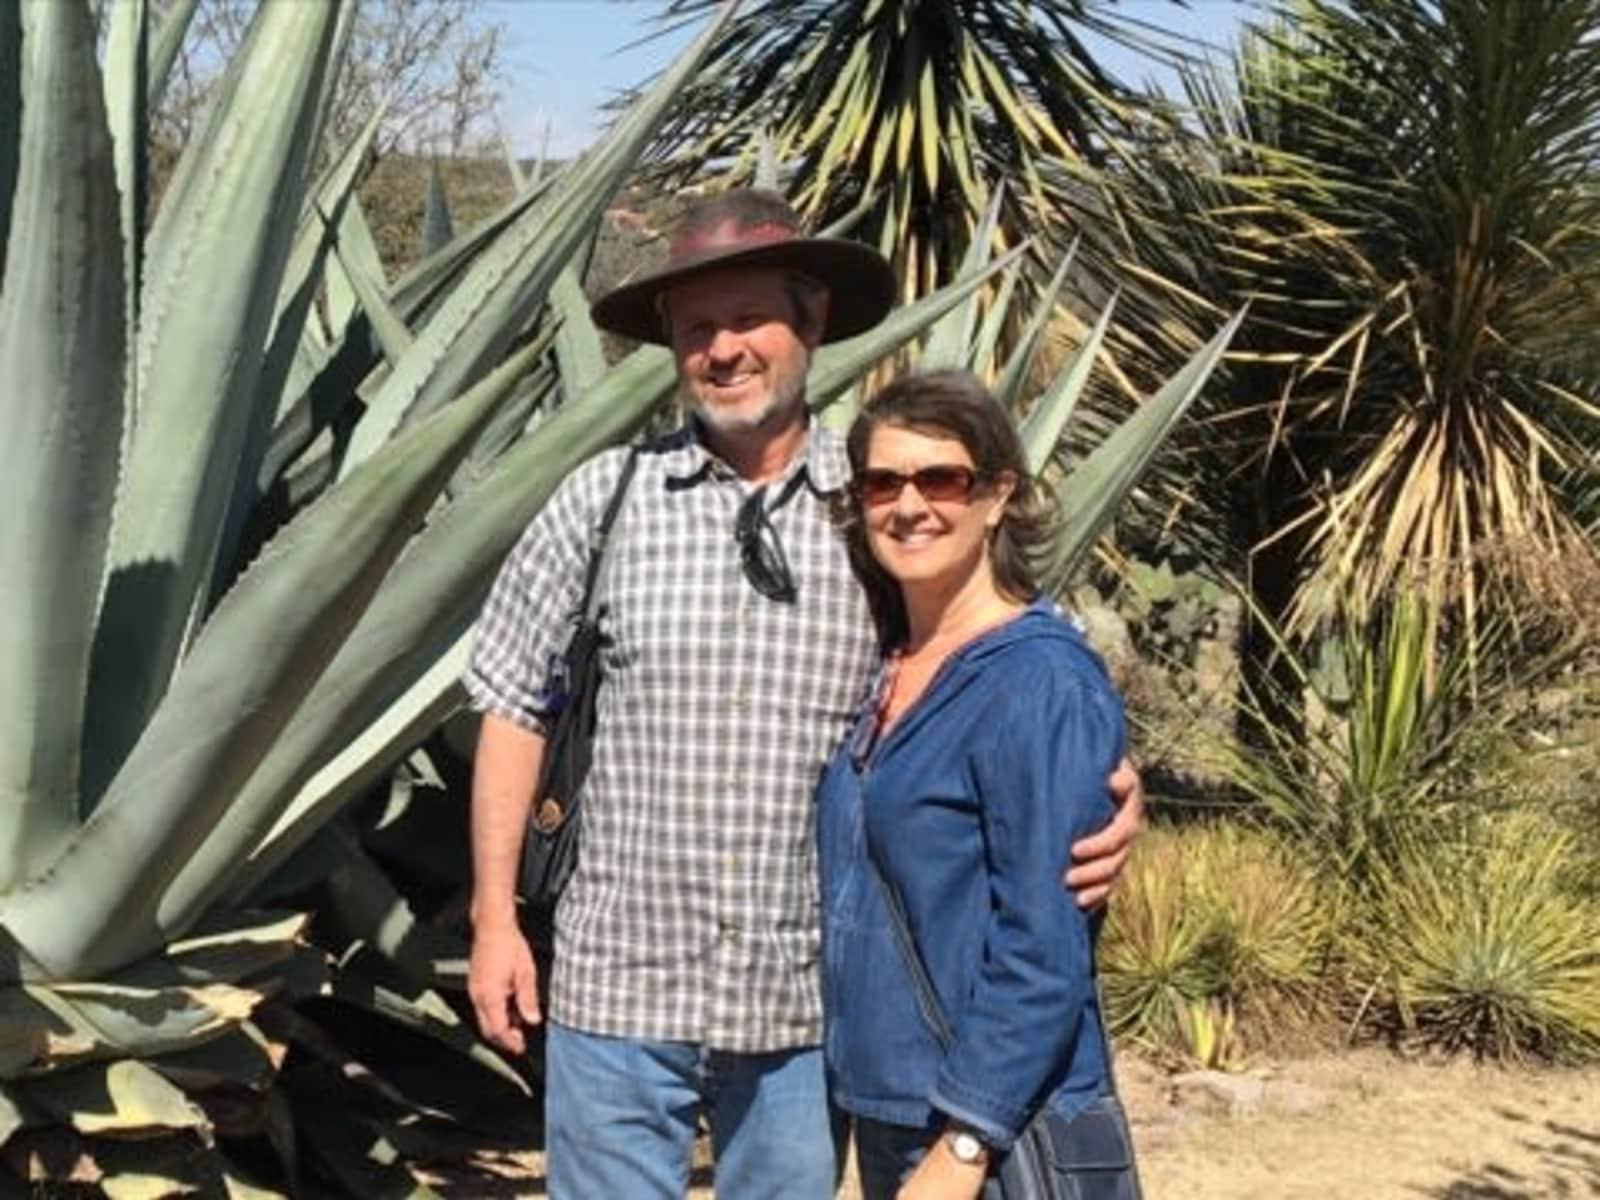 Danny & Joy from Ensenada, Mexico